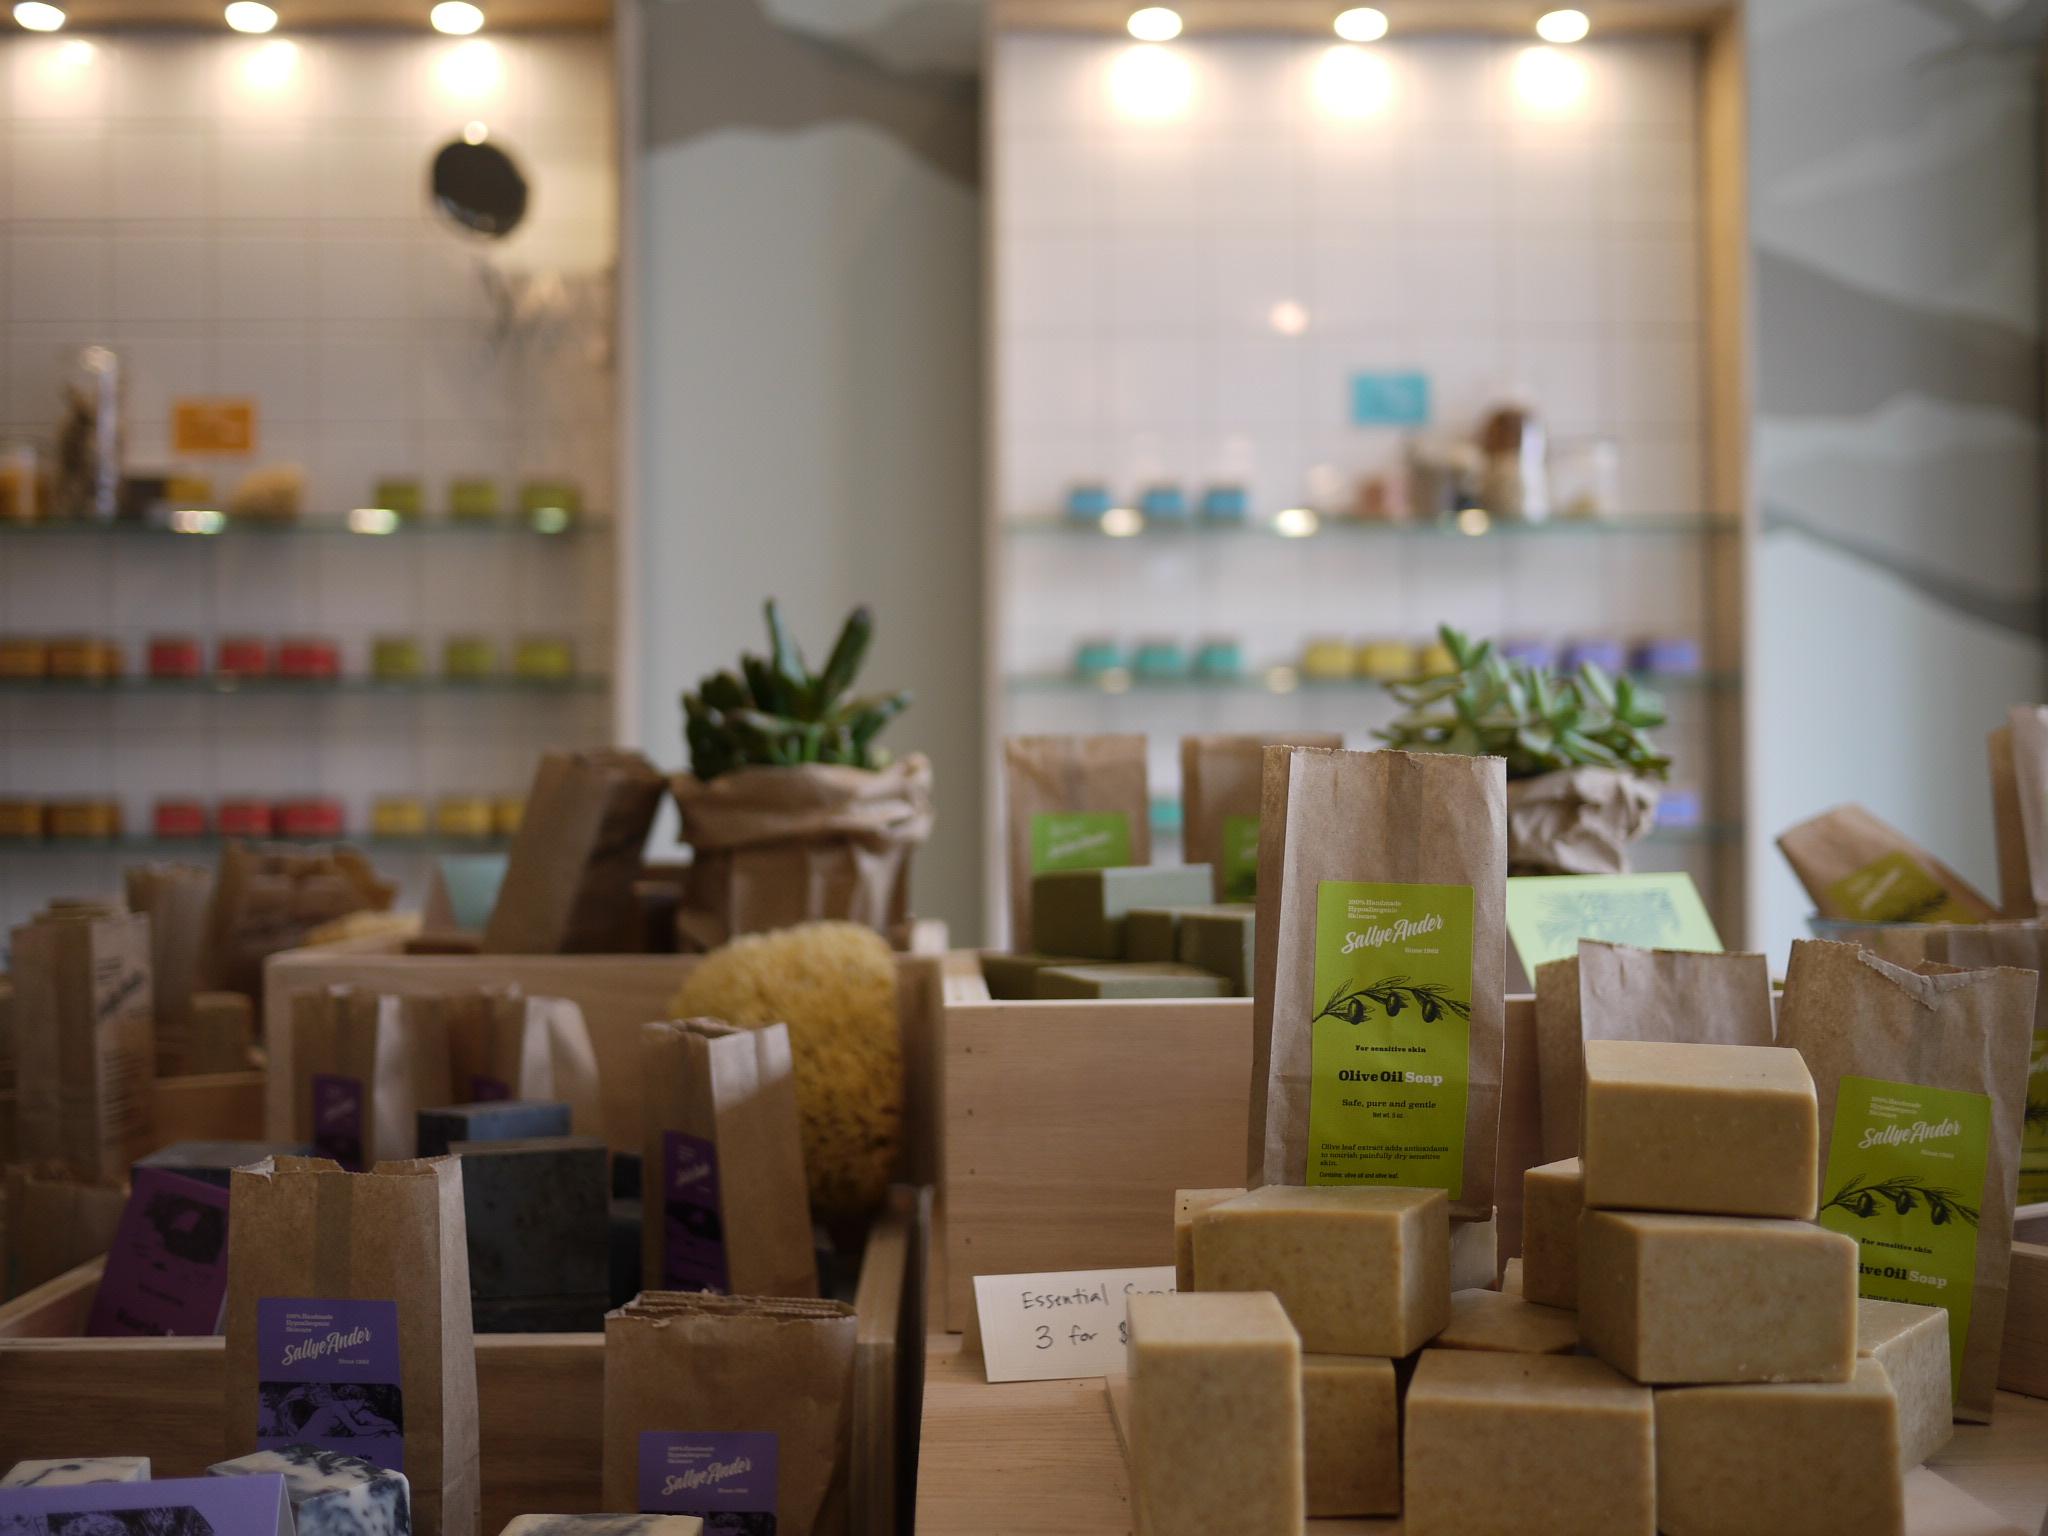 Inside of SallyeAnder's new flagship location. Photo Credit: Leigh Baumann for A Little Beacon Blog